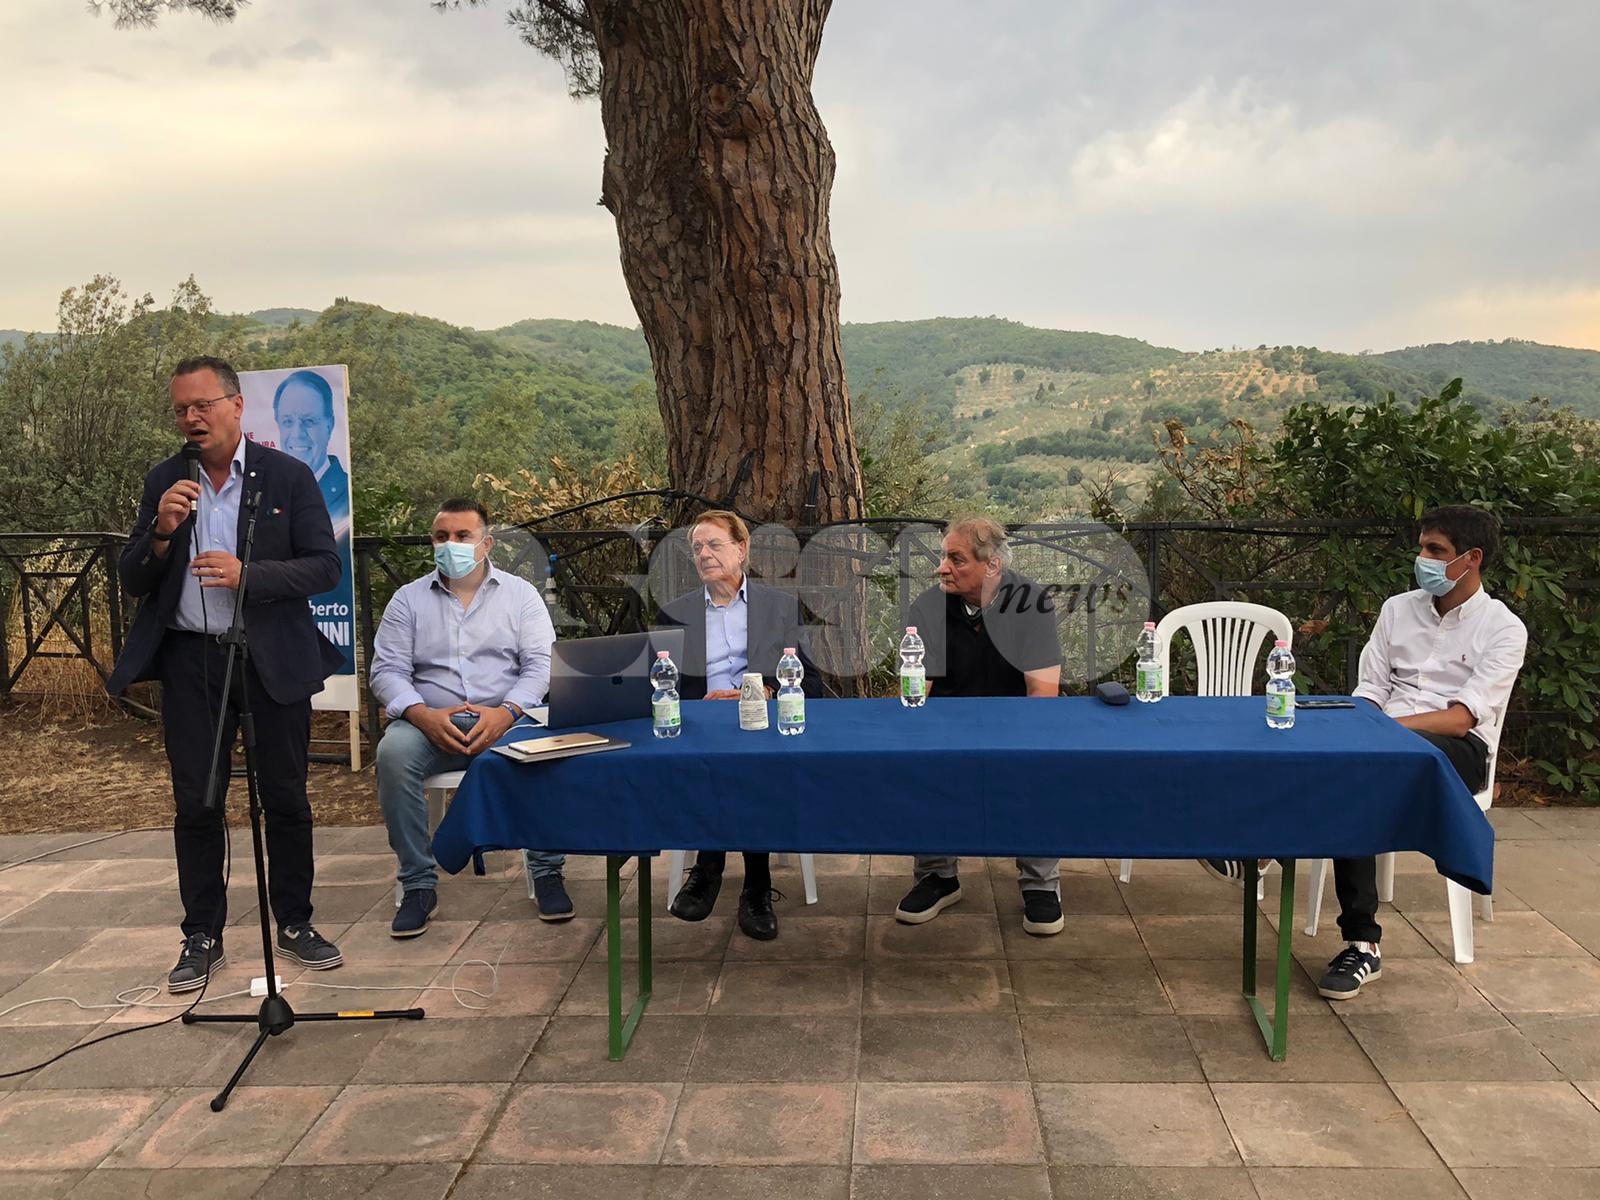 Lamberto Marcantonini si ricandida a sindaco di Bettona (foto)